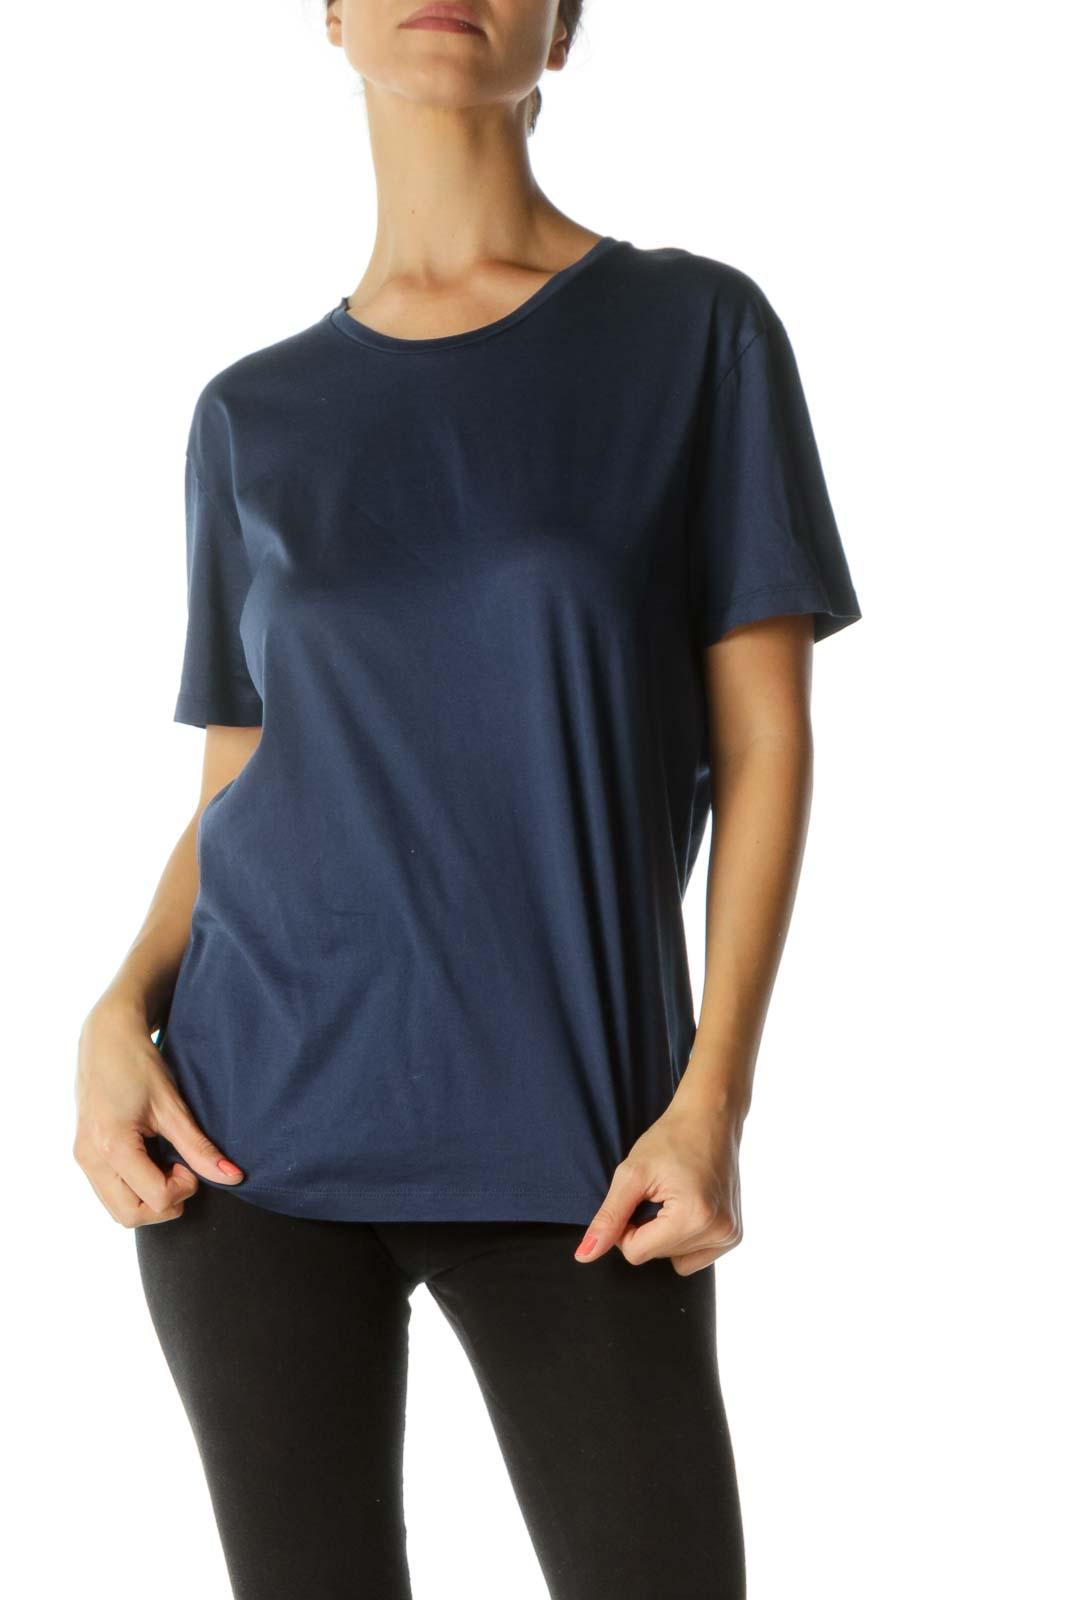 Blue 100% Cotton Round Neck Shiny T-Shirt Front